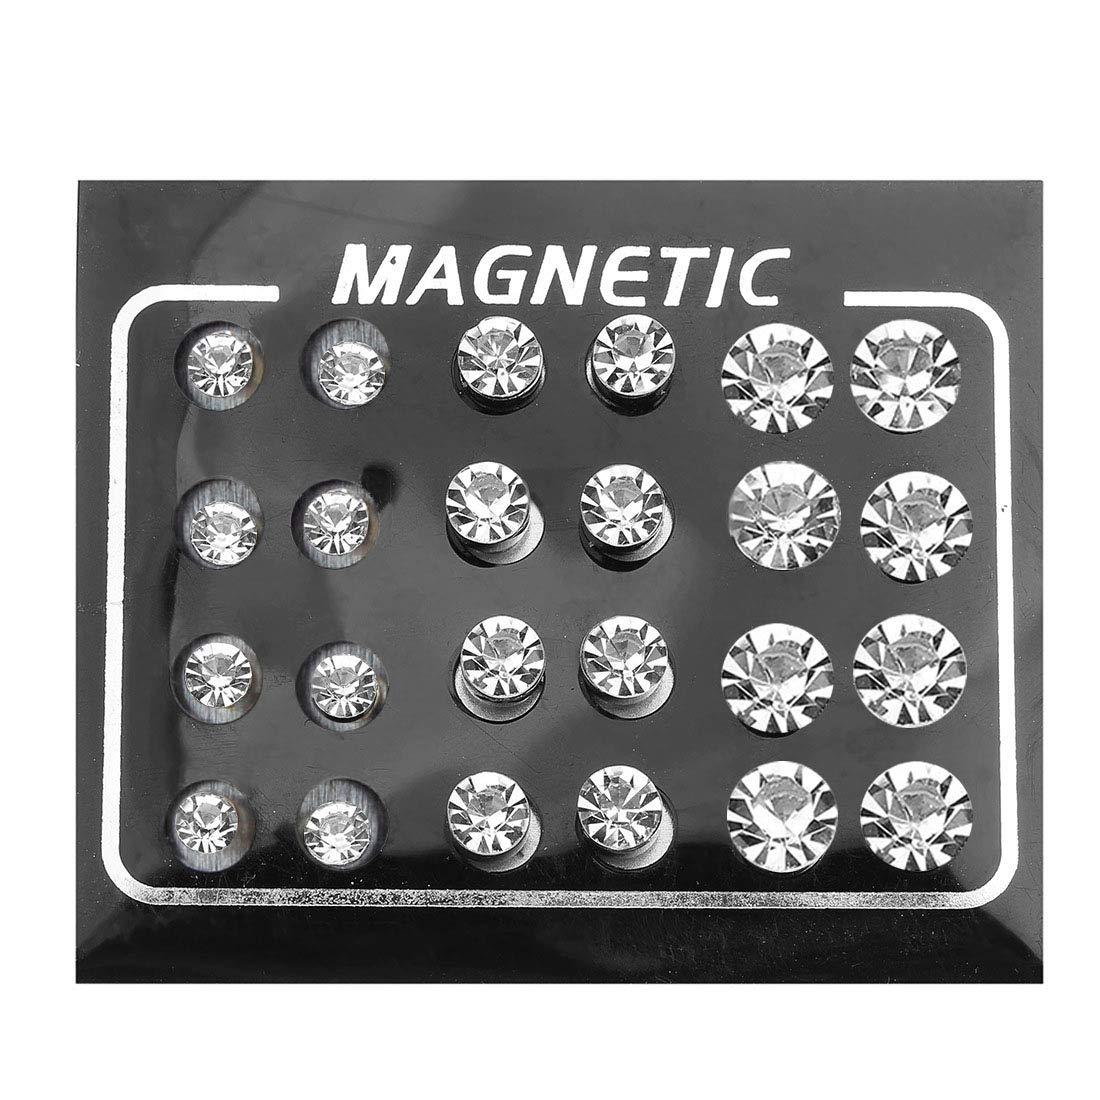 24 Pieces Magnetic Fake Plug Lot Fake Gauges Ear Studs Round Rhinestone Stud Earring Mix Gauges Look…